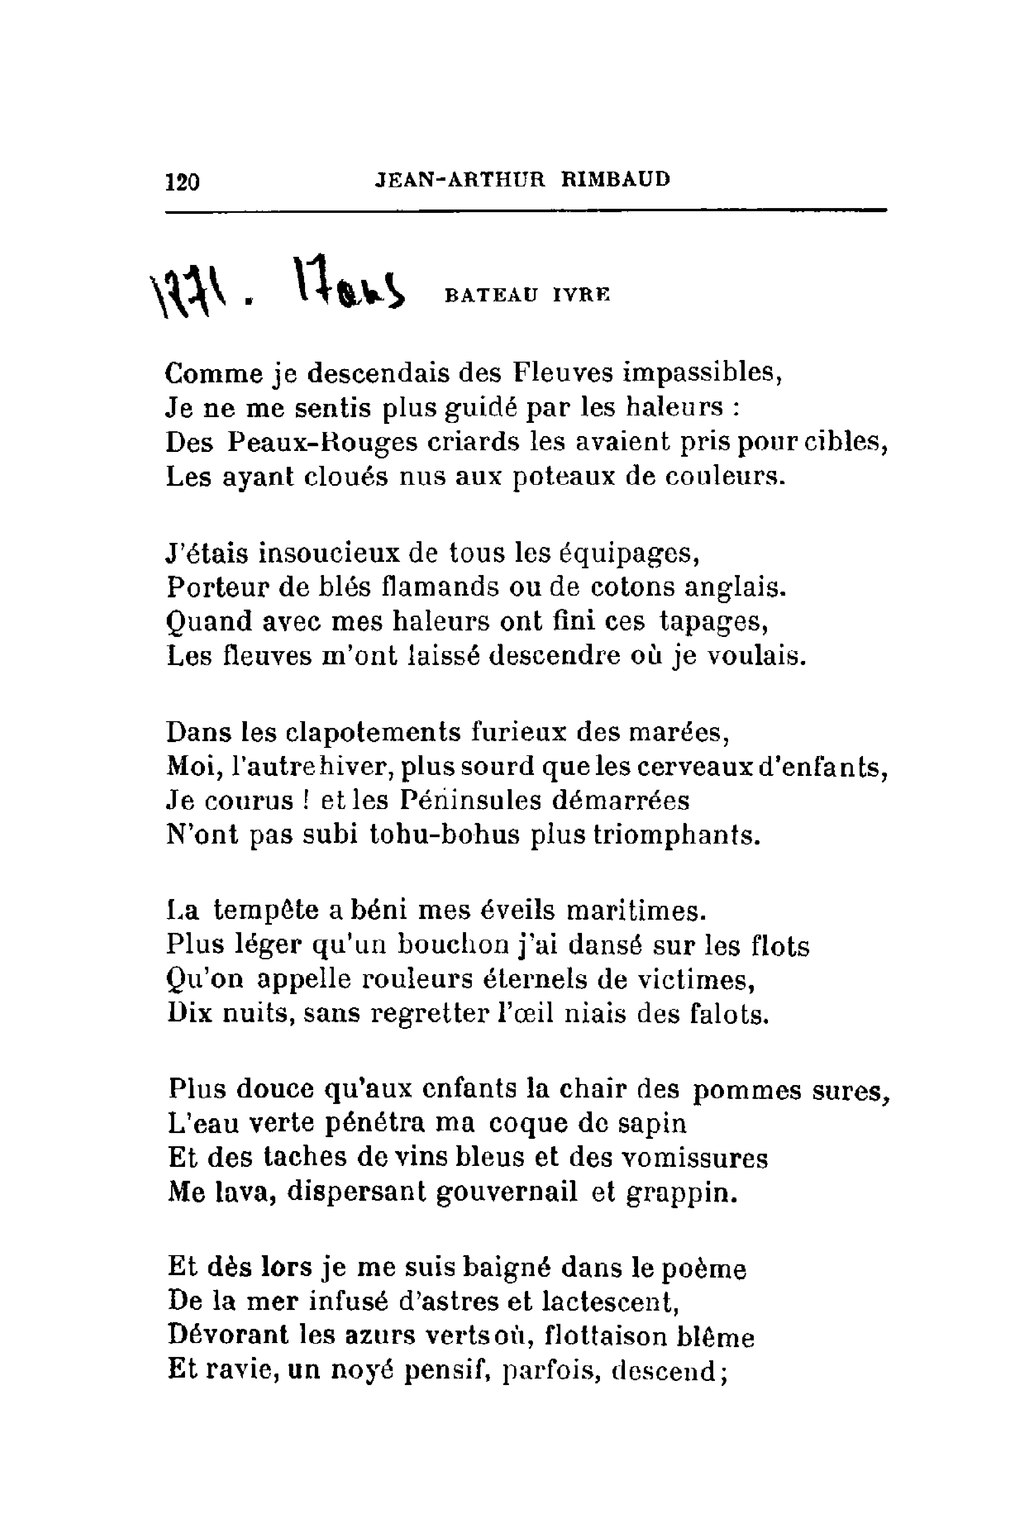 Pageberrichon Jean Arthur Rimbaud 1912djvu116 Wikisource